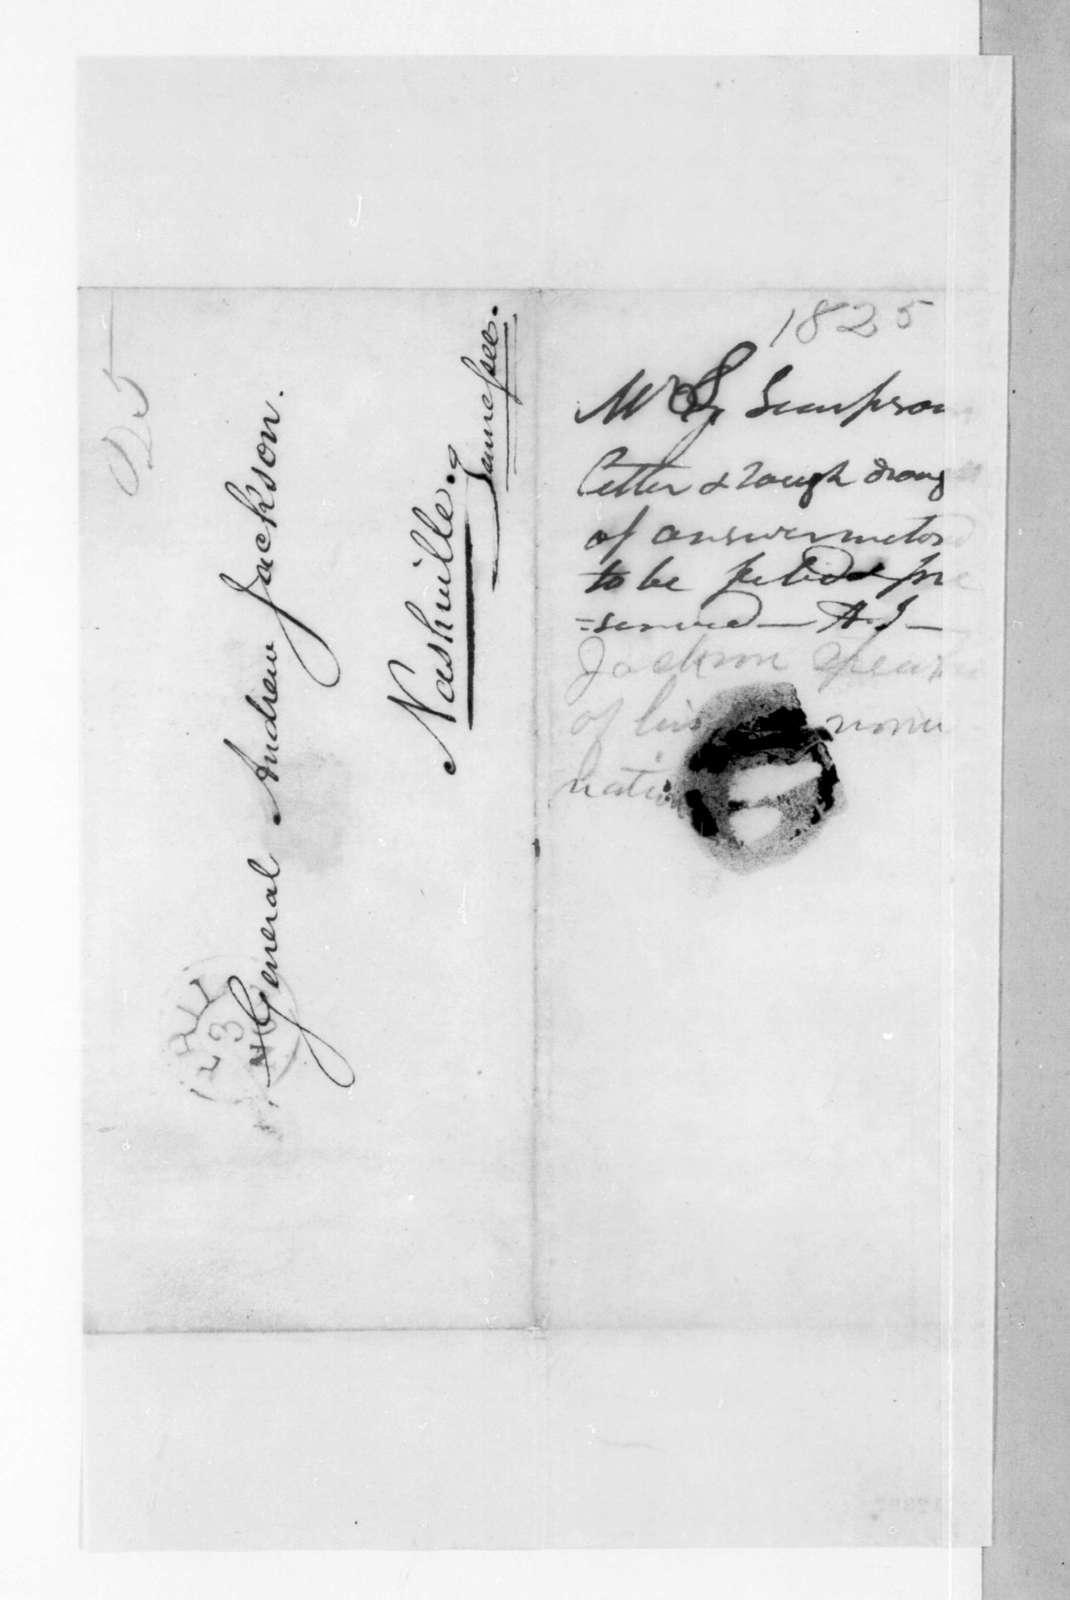 Stephen Simpson to Andrew Jackson, November 3, 1825